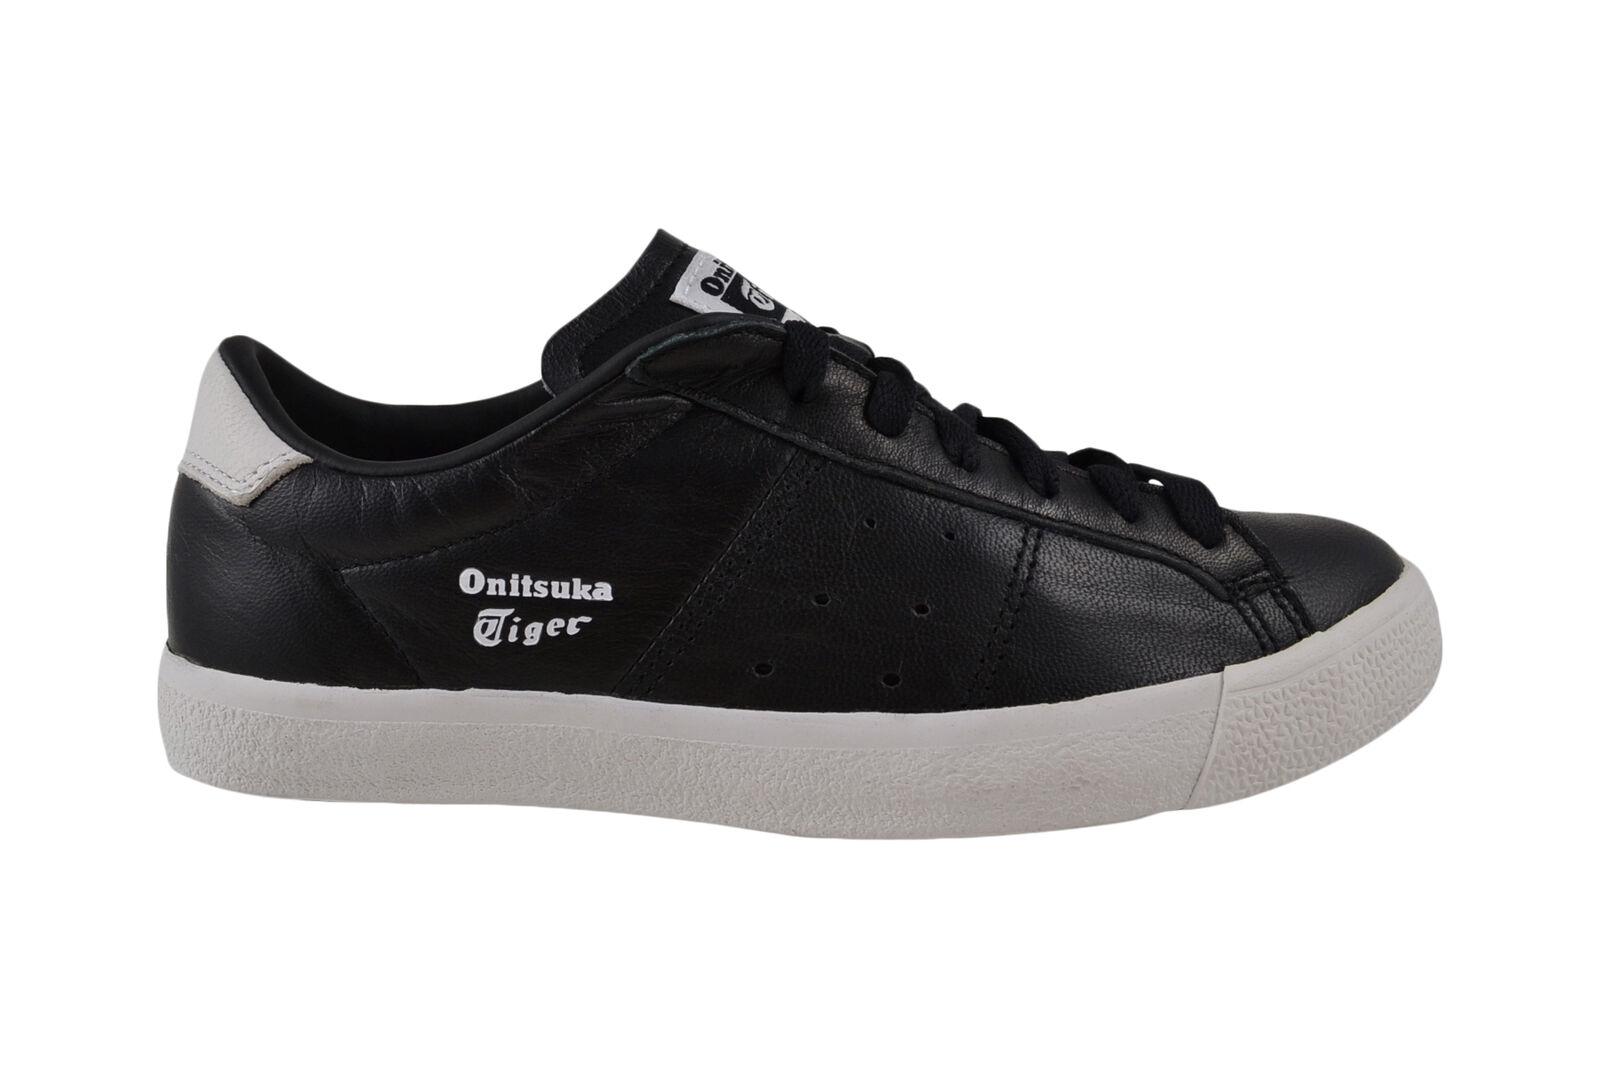 Asics Onitsuka Tiger Lawnship schwarz/Weiß Sneaker/Schuhe